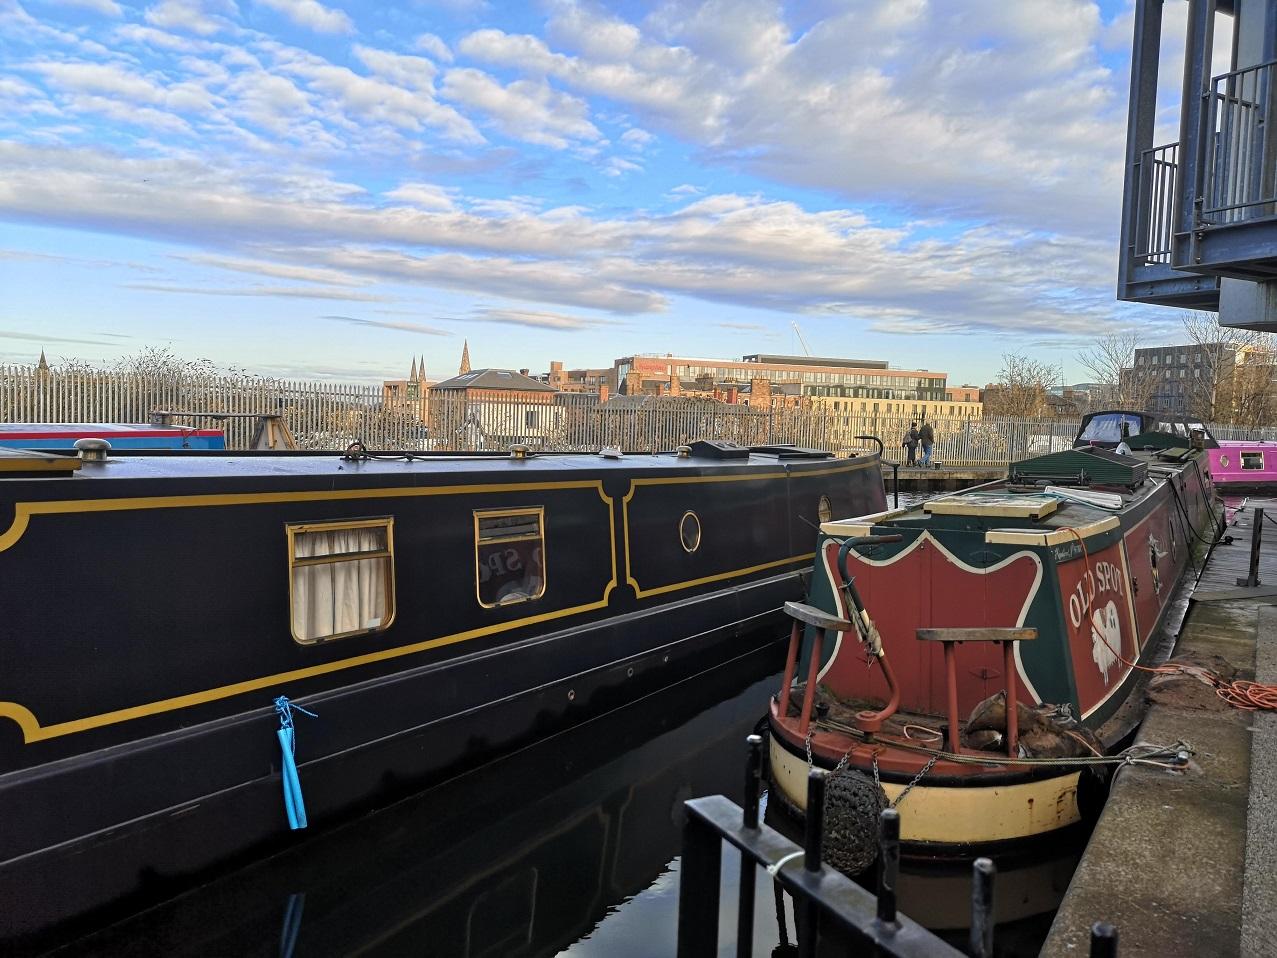 Canal boats, Edinburgh and Glasgow Union Canal